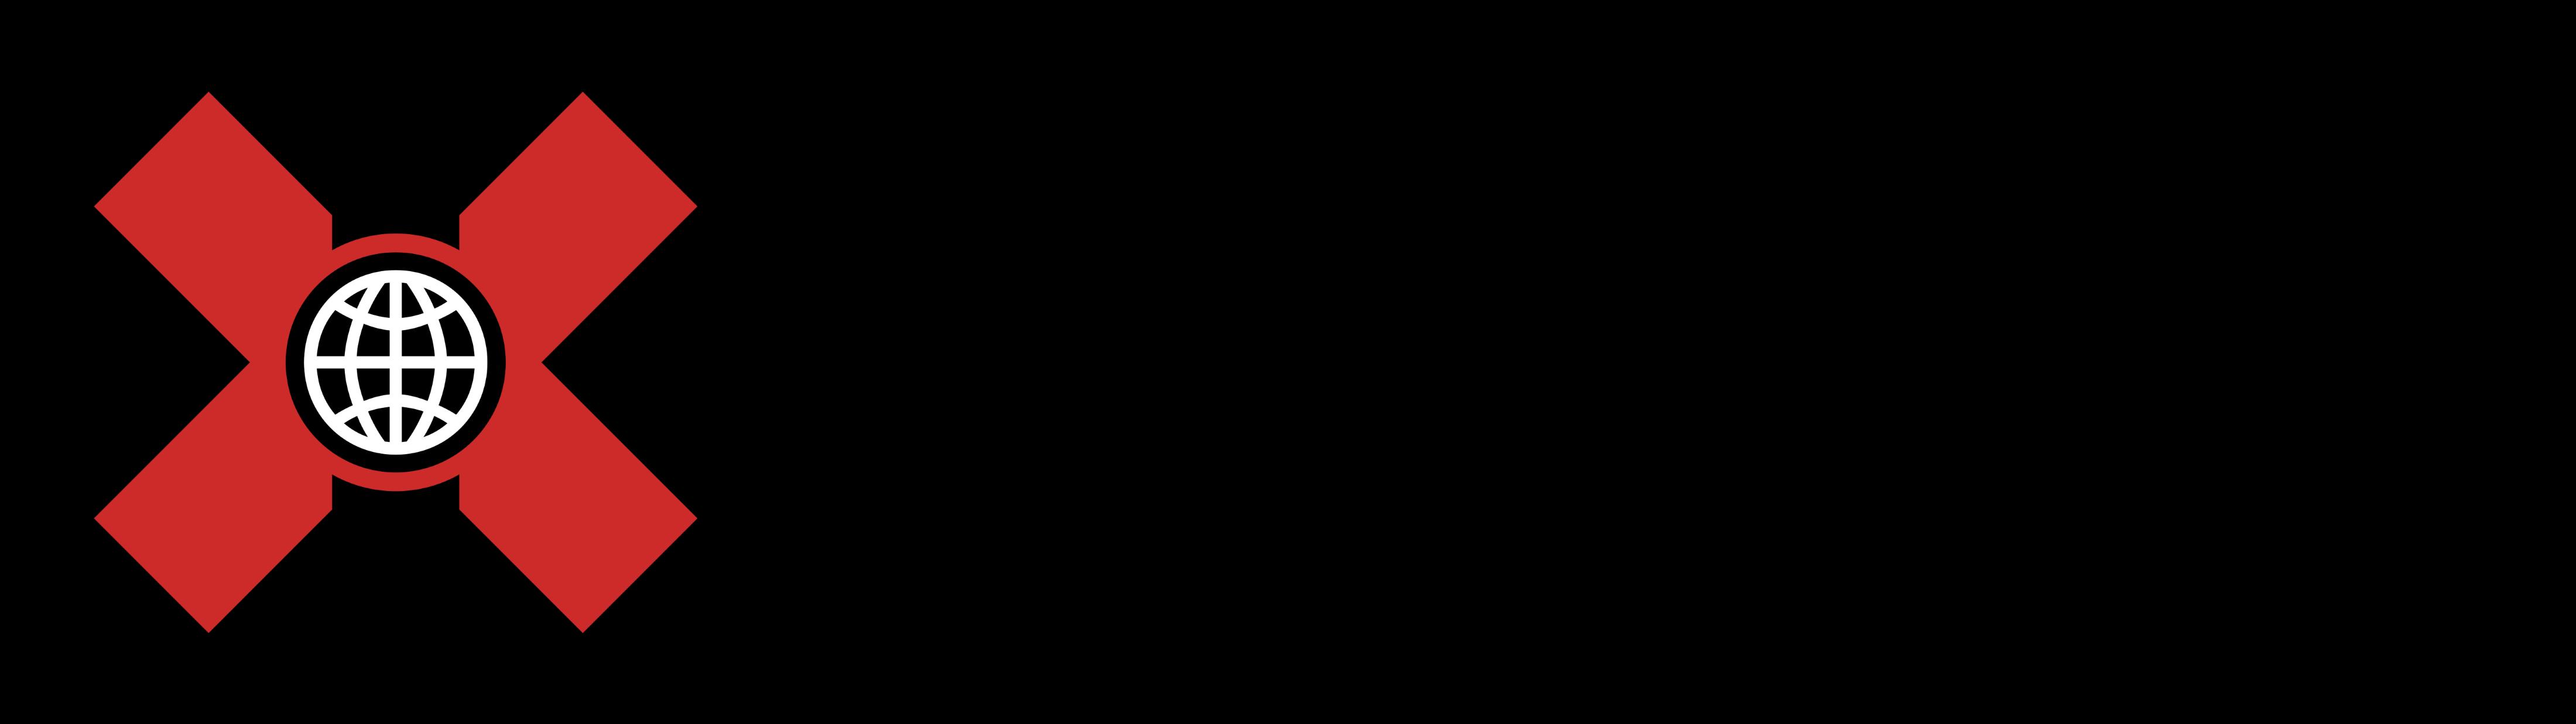 X_Games_logo_logotipo.png